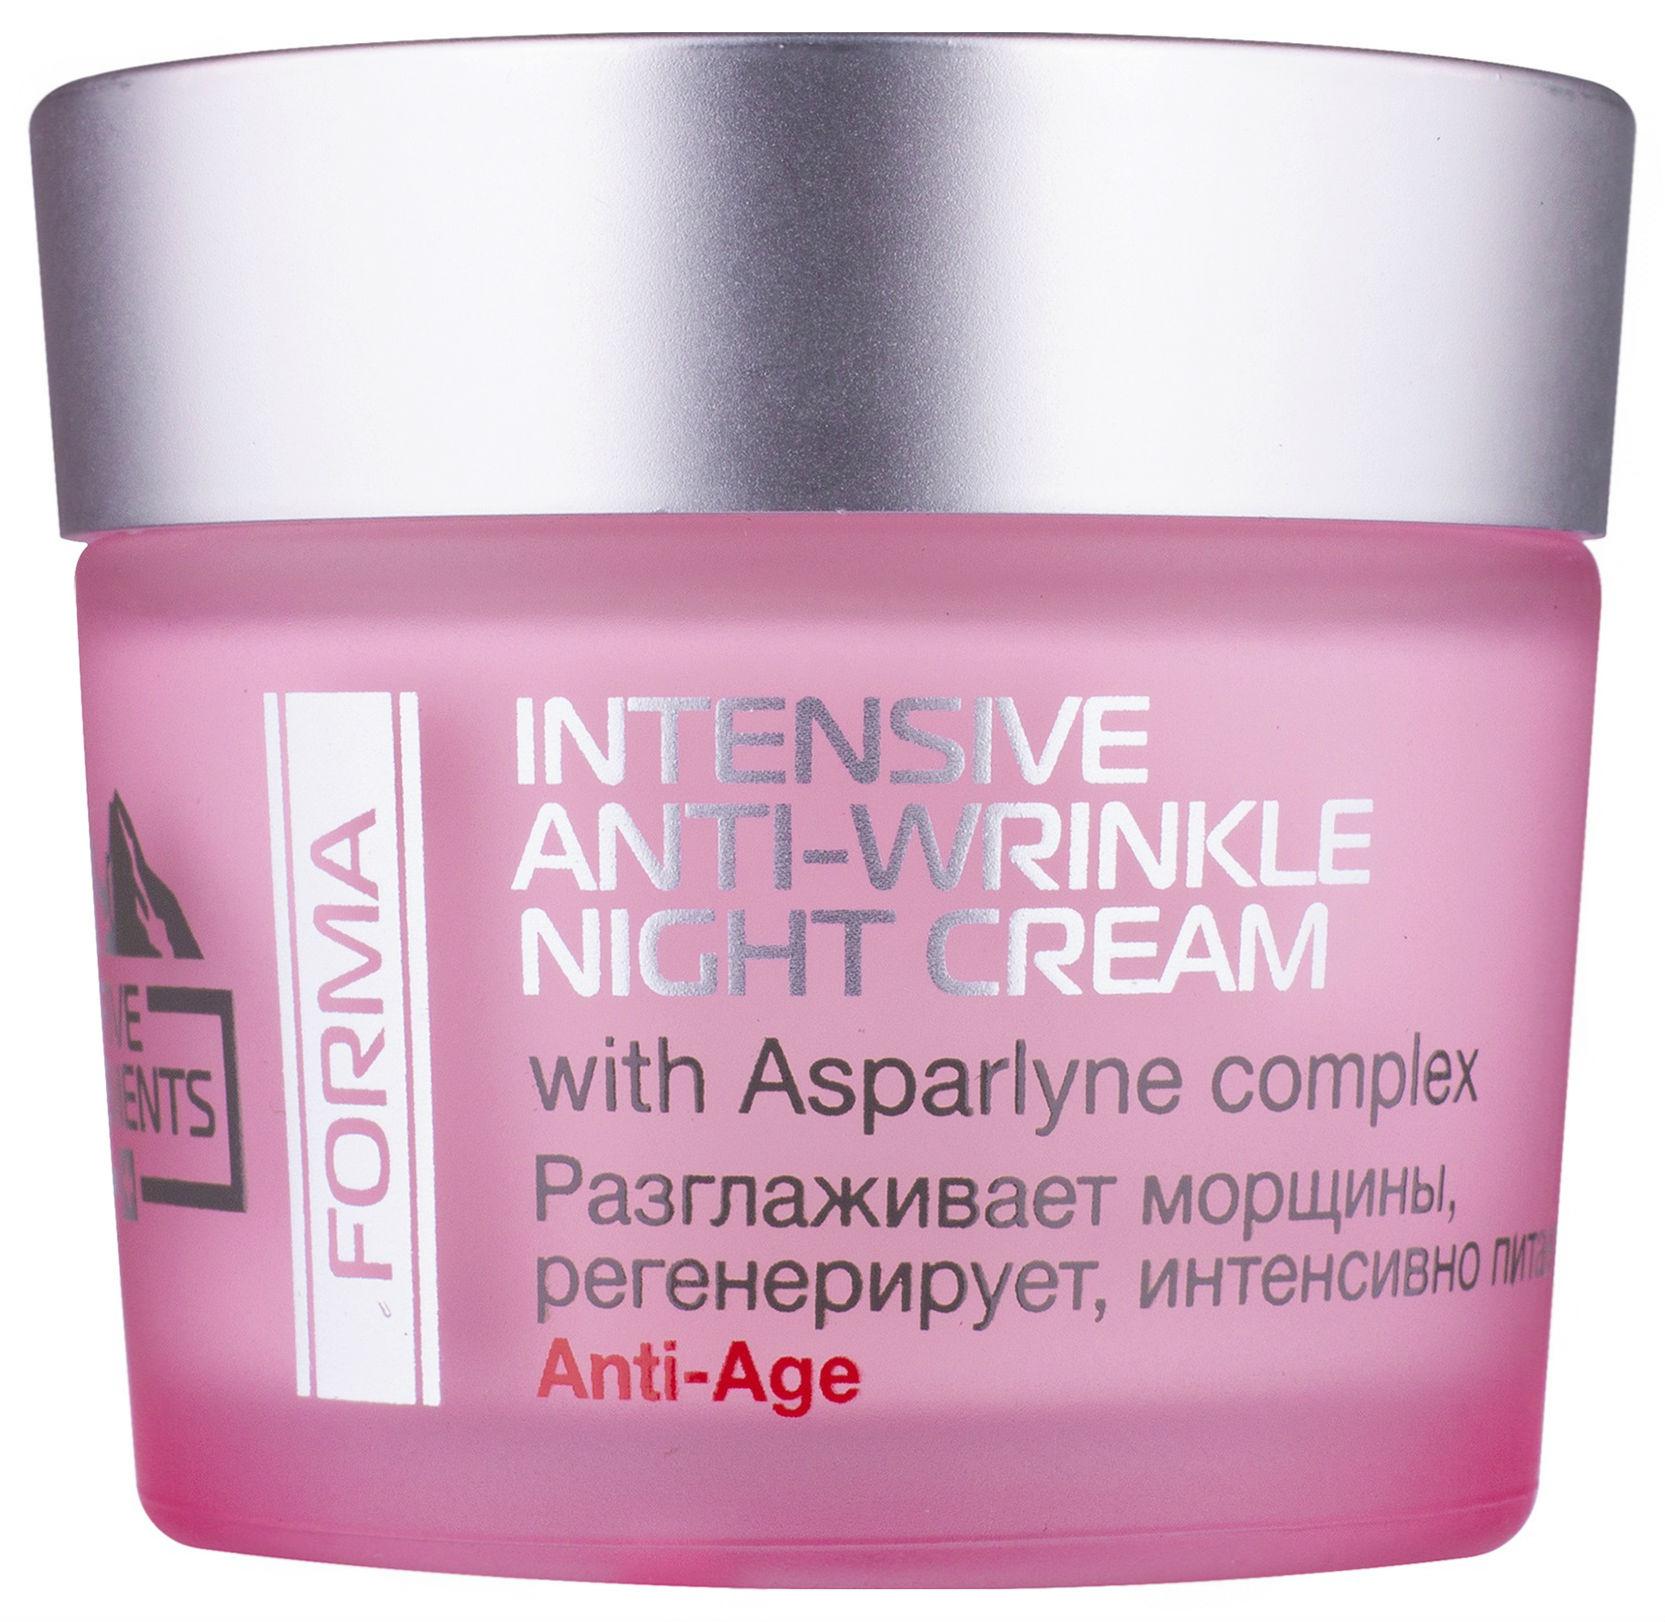 Купить Крем для лица Five Elements Intensive Anti-Wrinkle Night Cream 50 мл